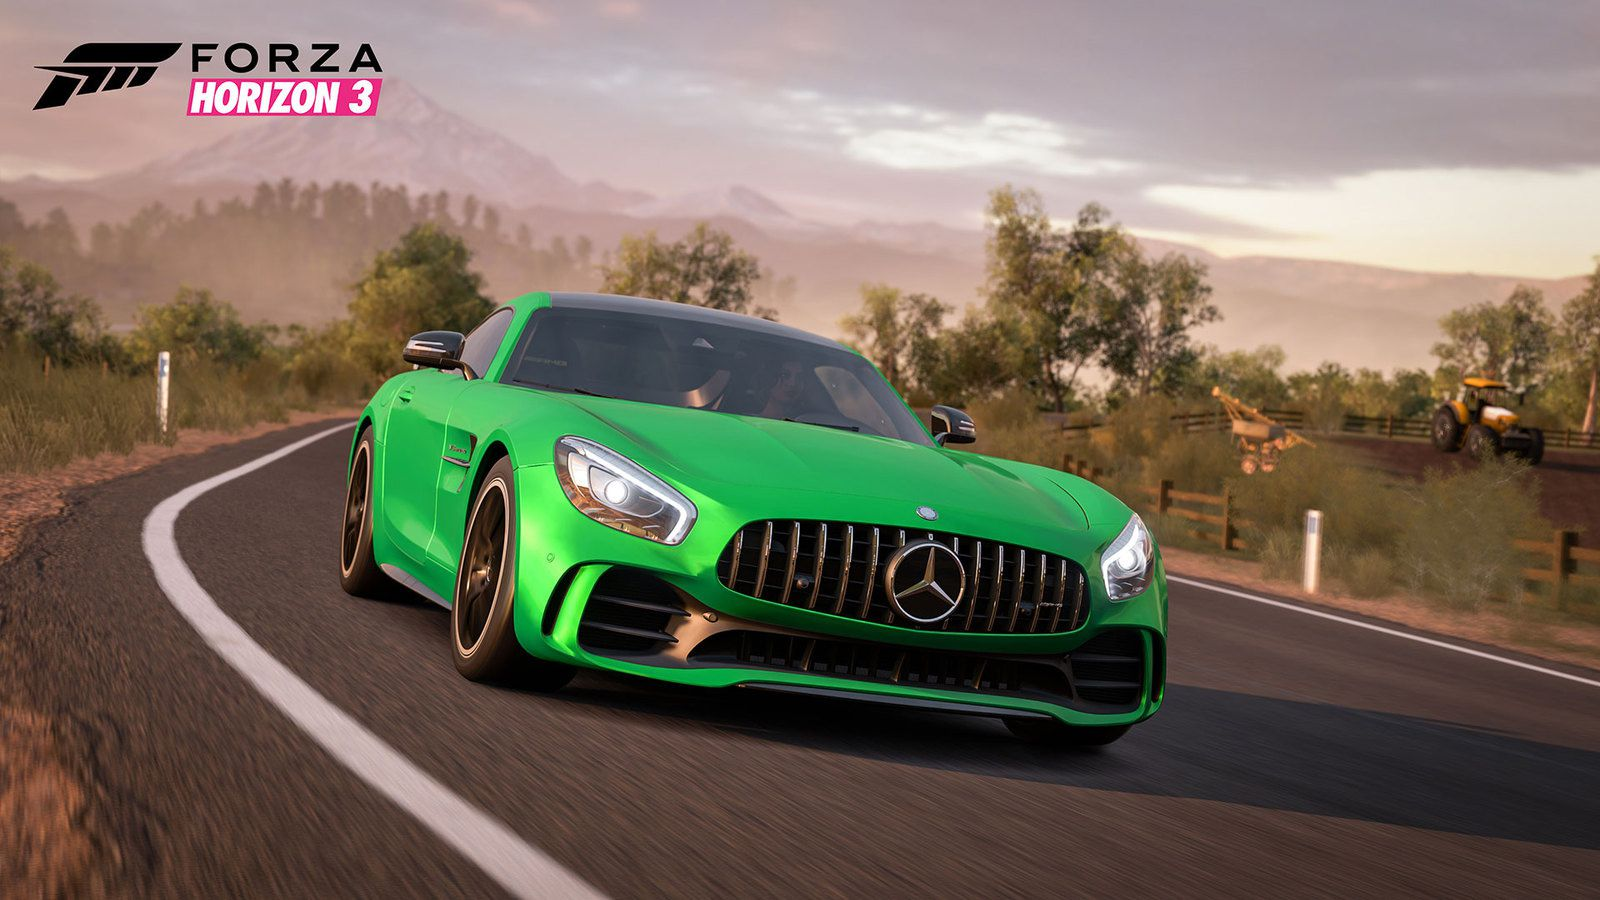 Forza Horizon 3 - Logitech G Car Pack